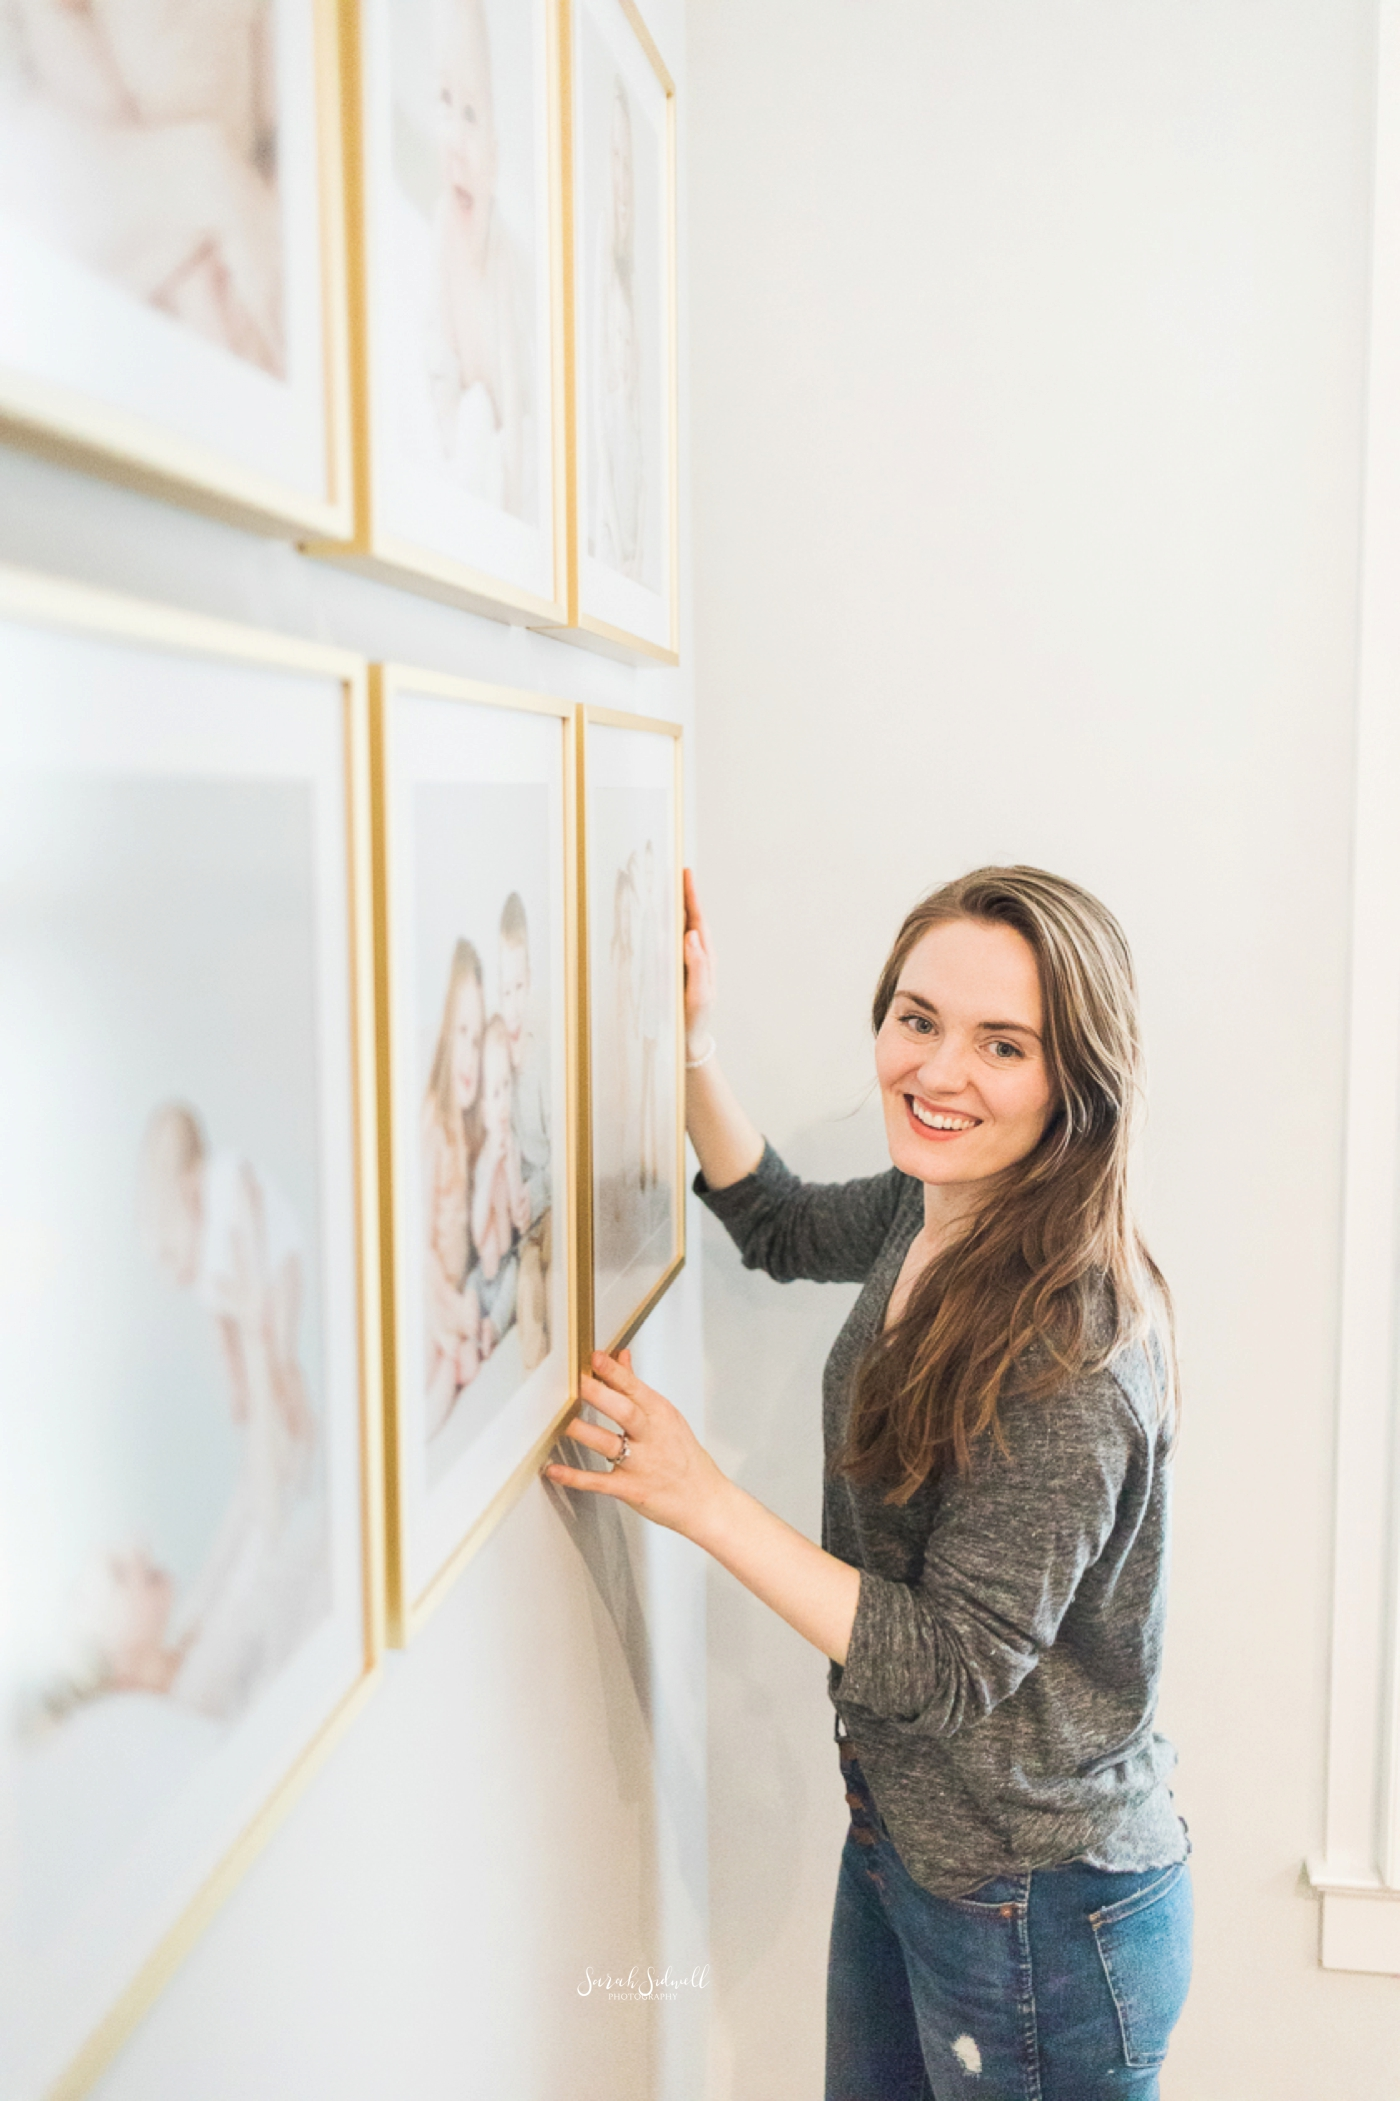 Family Photo Gallery Wall   Use photos as stylish home decor